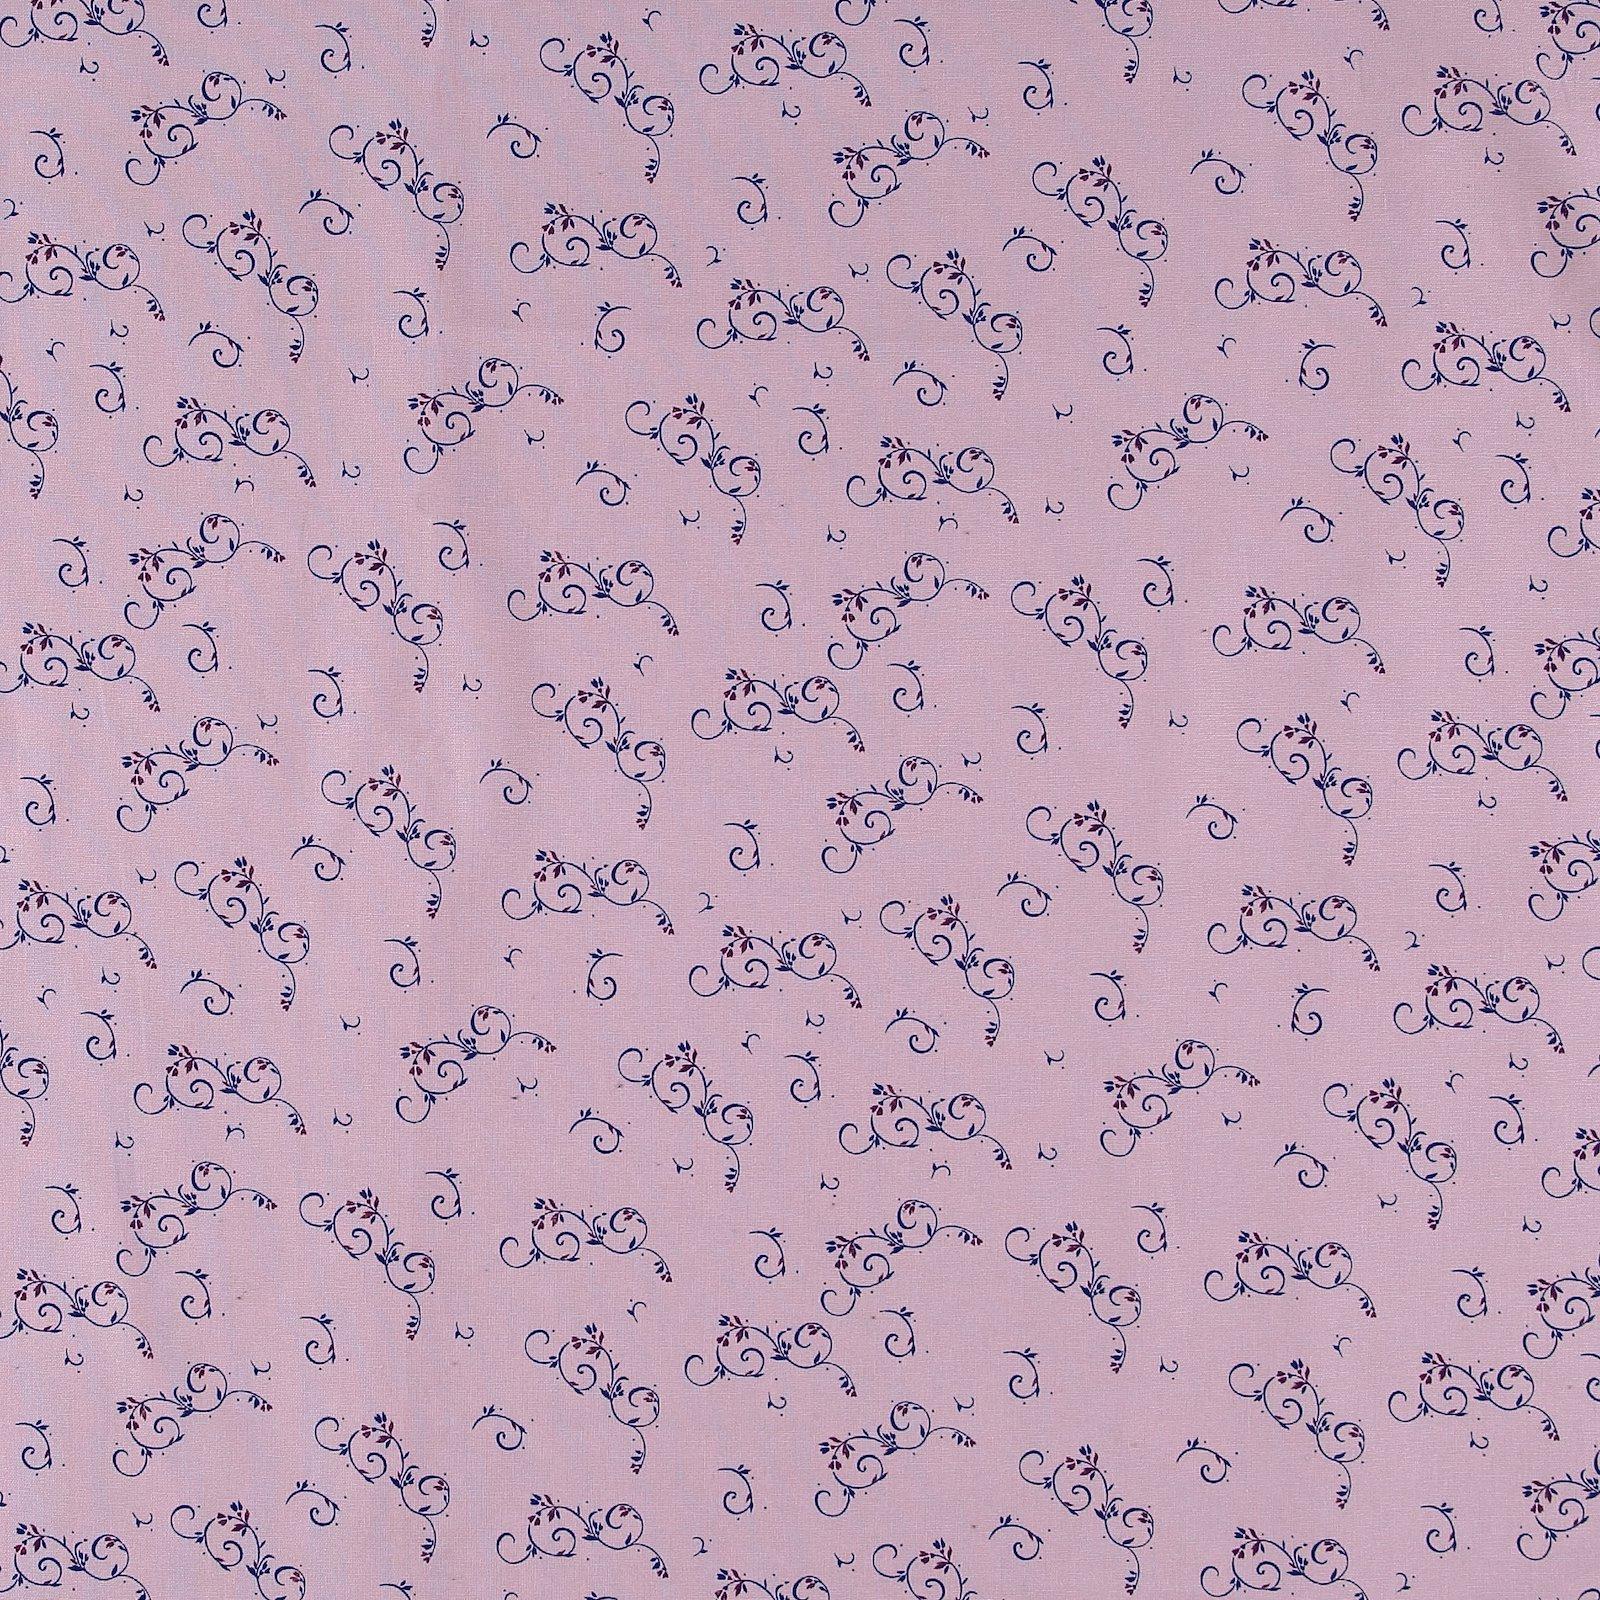 Linen/cotton light heather w print 410139_pack_sp